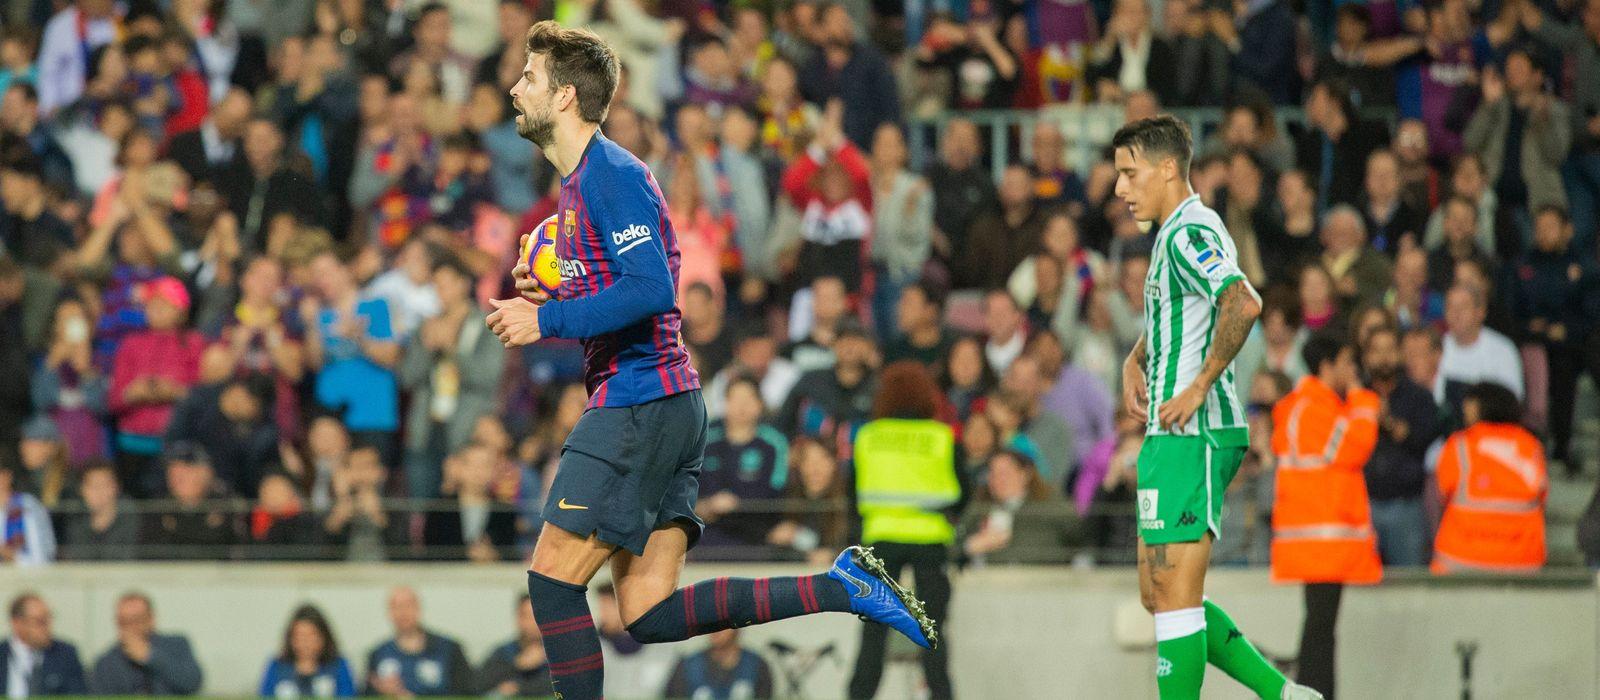 Barça-Betis: La Liga returns to the Camp Nou